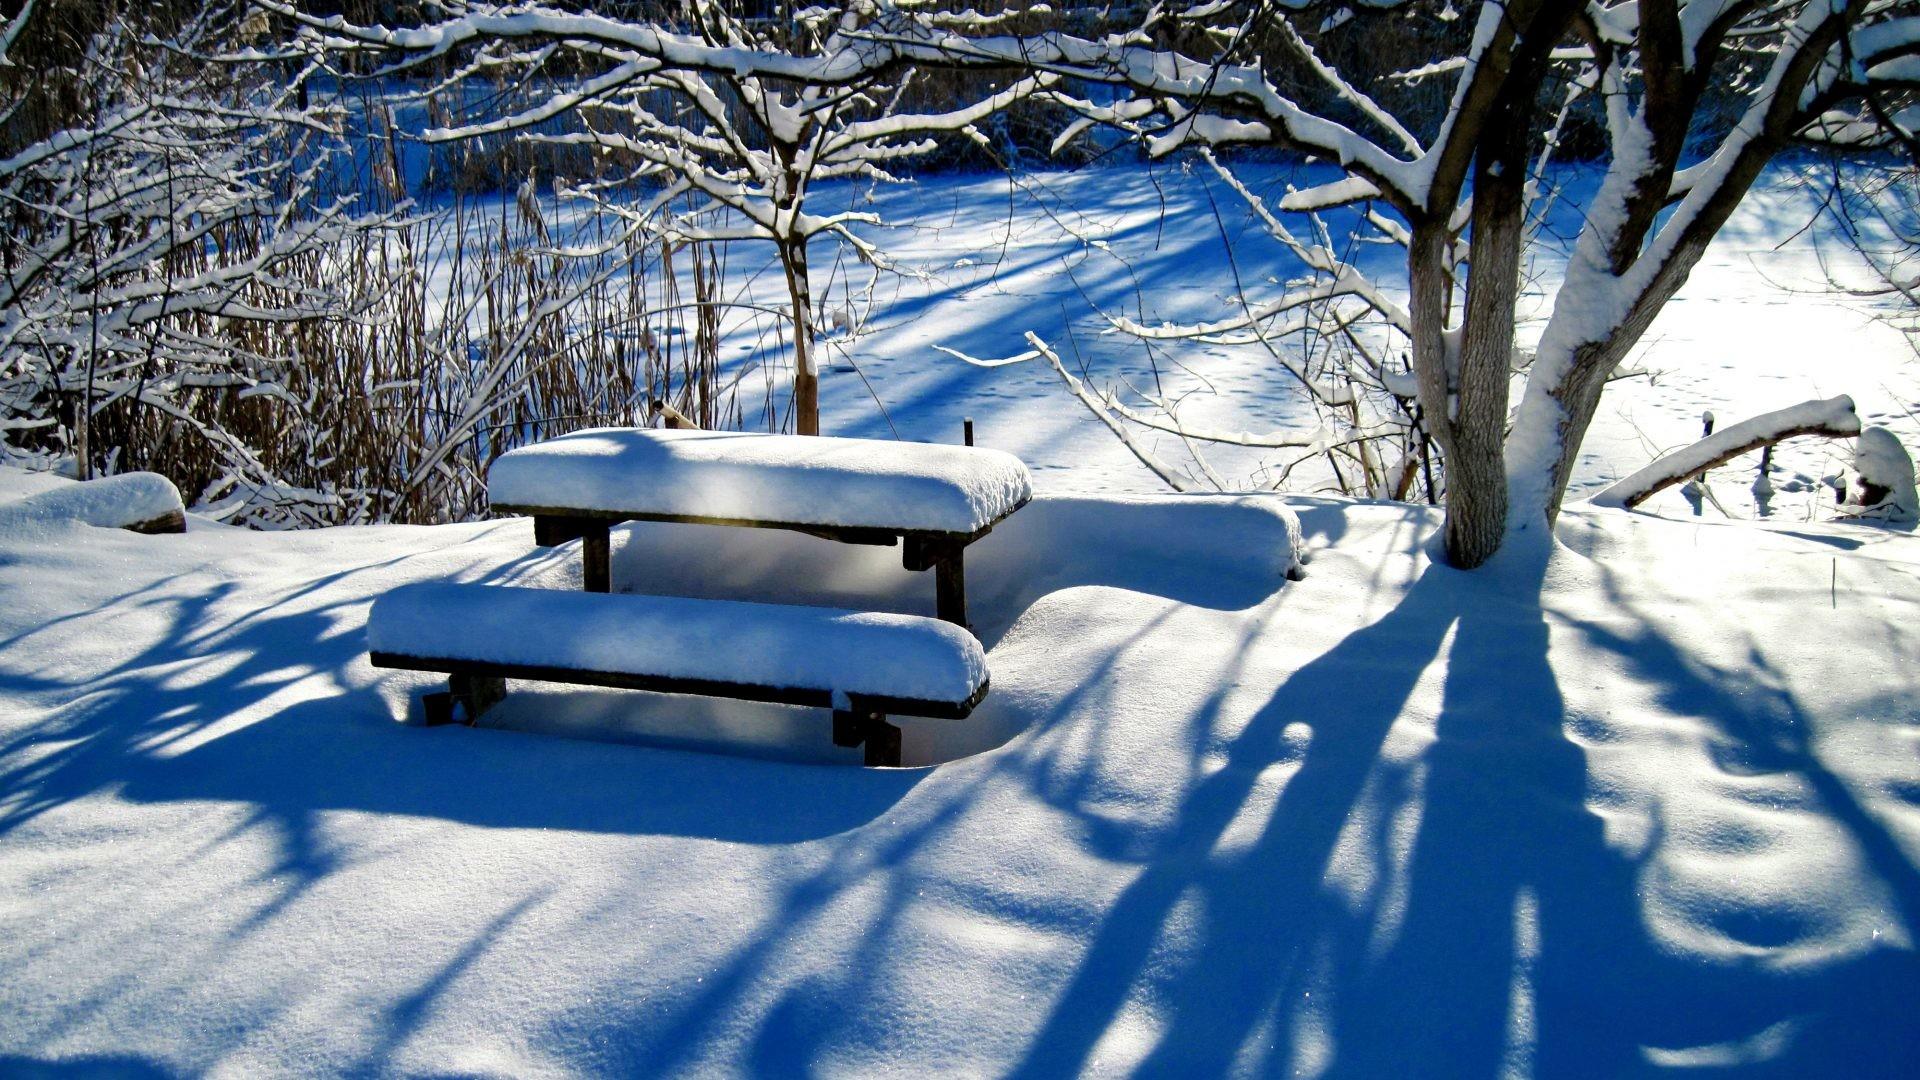 Central Park Iphone 6 Wallpaper Winter Snow Scenes Wallpaper 49 Images